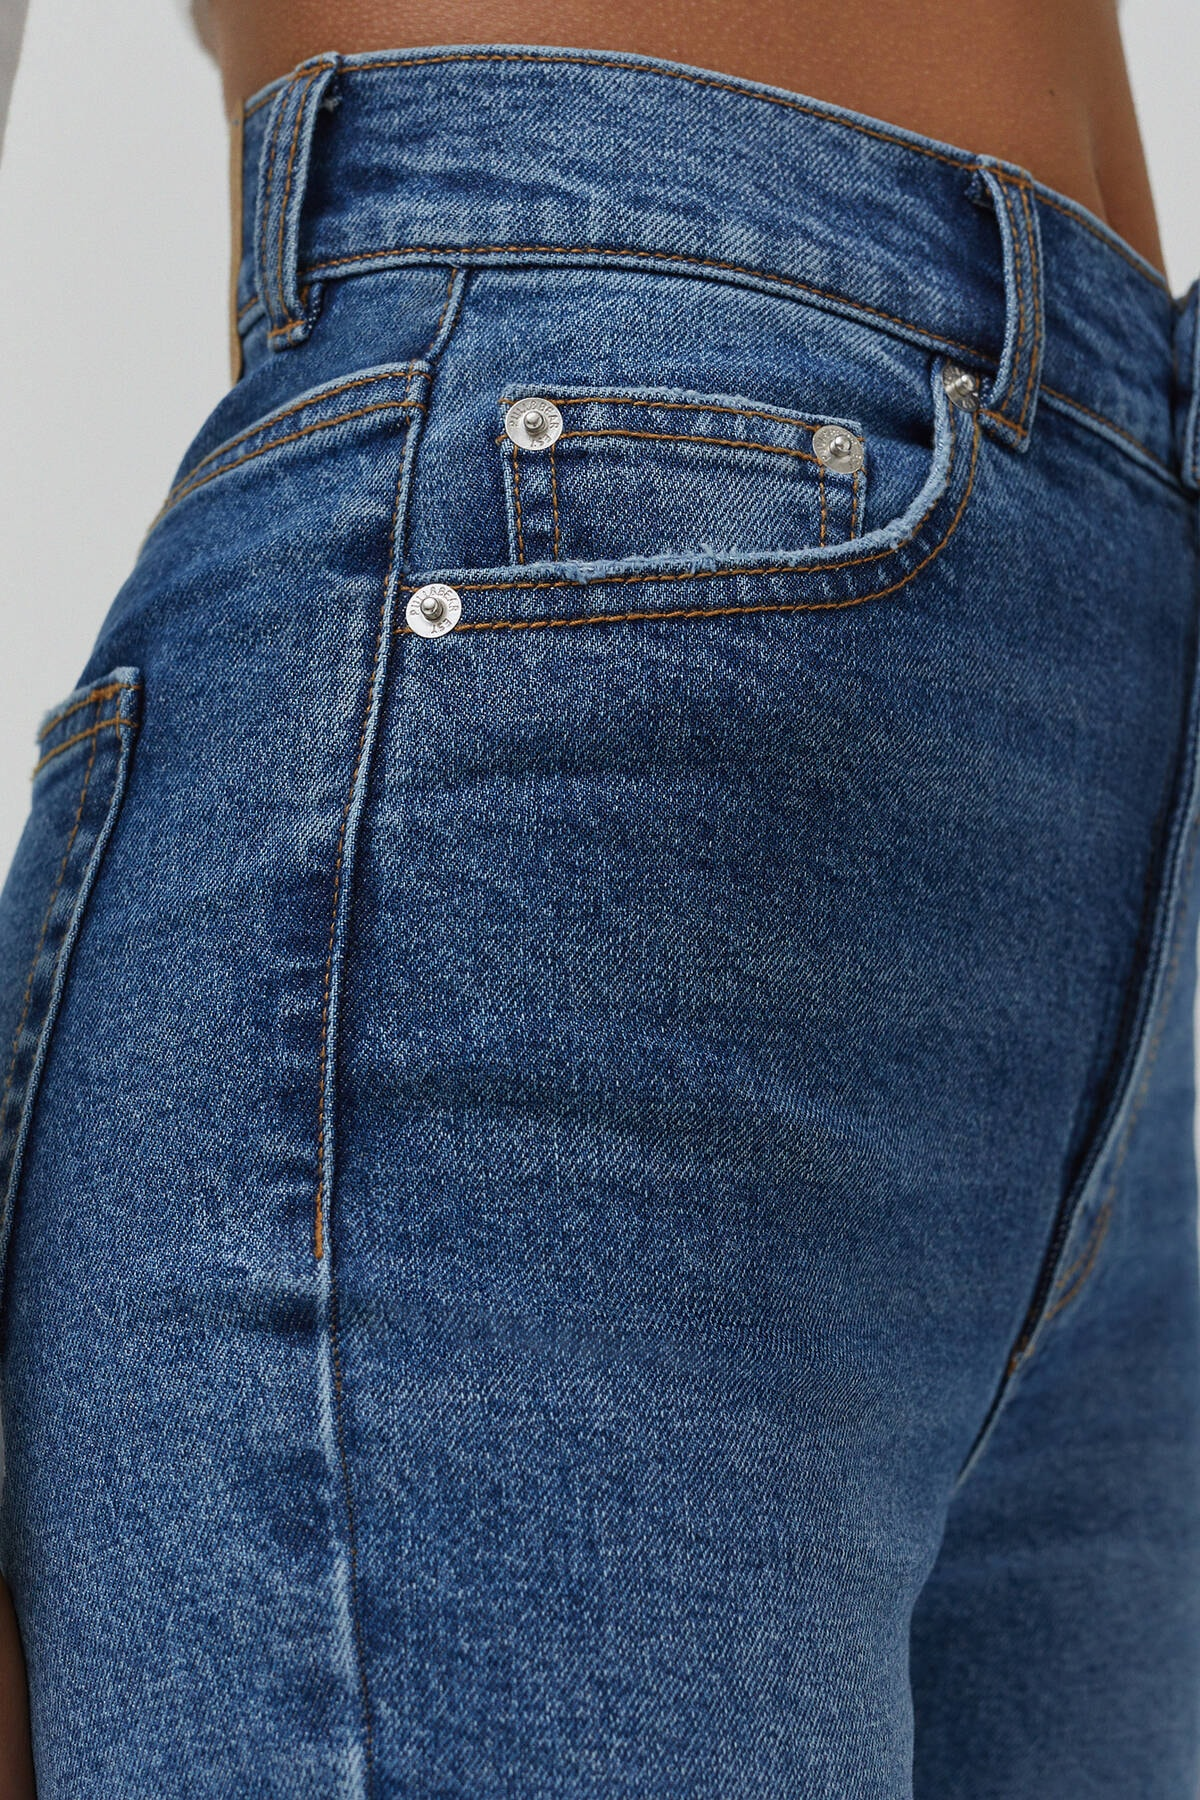 Pull & Bear Kadın Mavi Süper Yüksek Bel Slim Fit Mom Jean 04681315 1